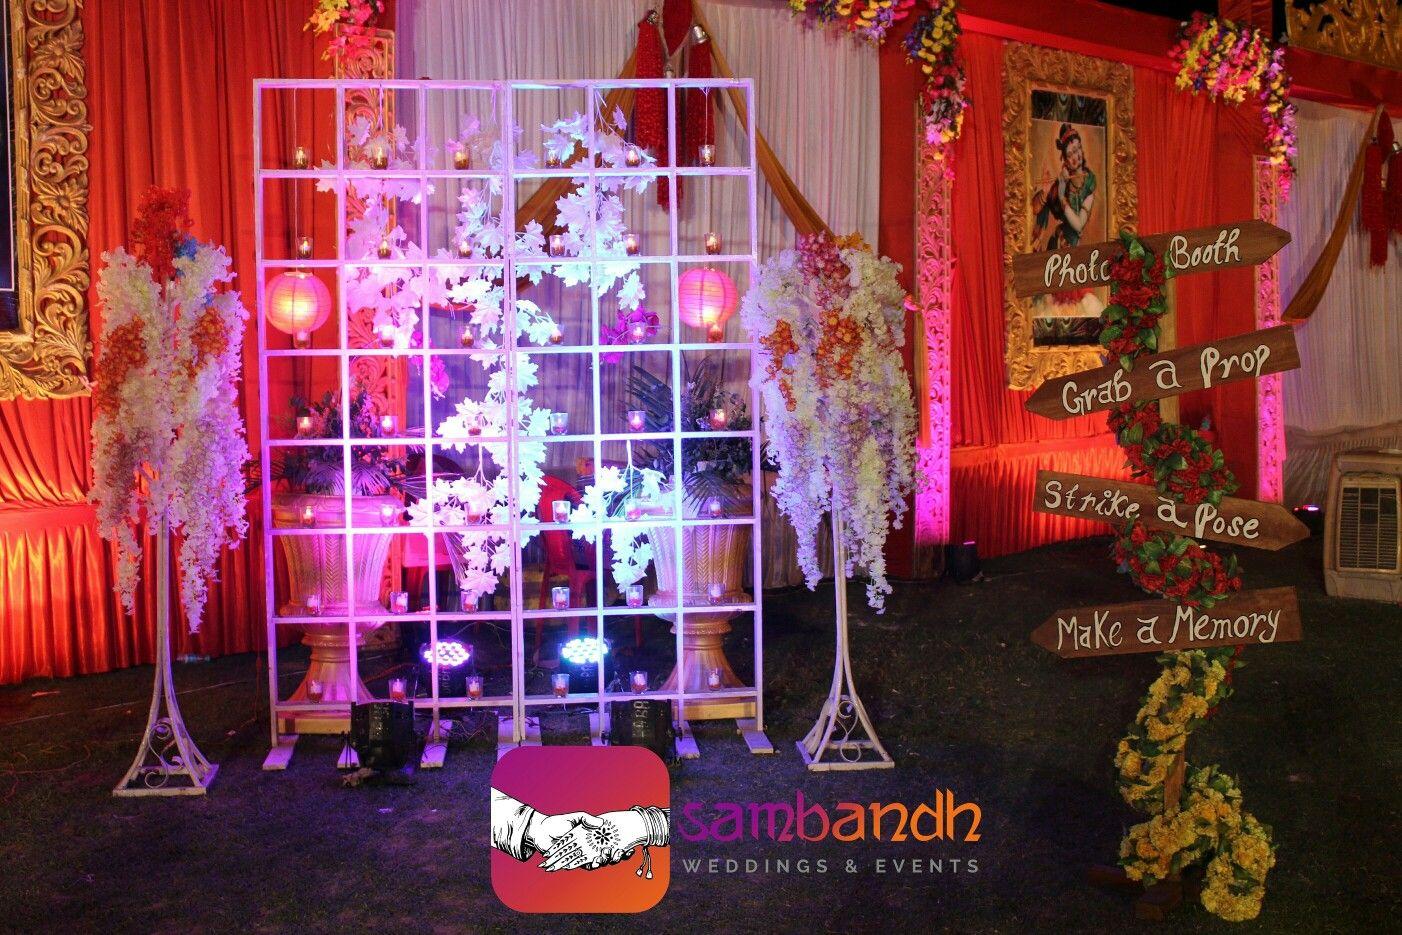 3707517c1a623 Selfie station , photo booth with props led par flowers | selfie ...